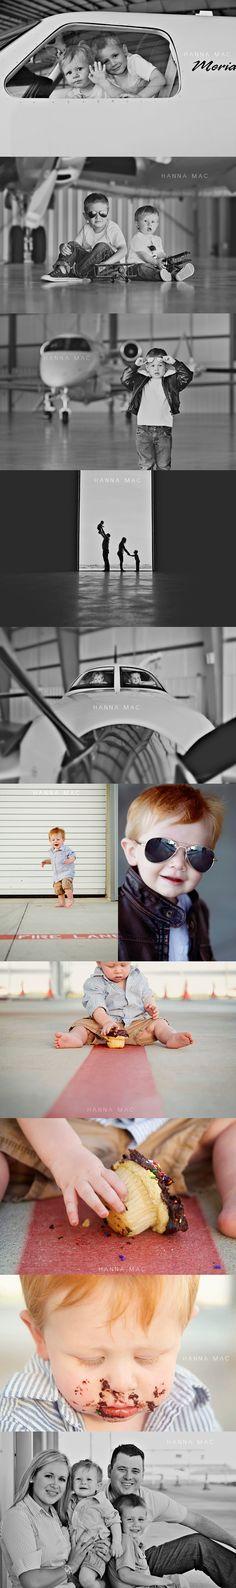 Airplane themed photoshoot » HANNA MAC